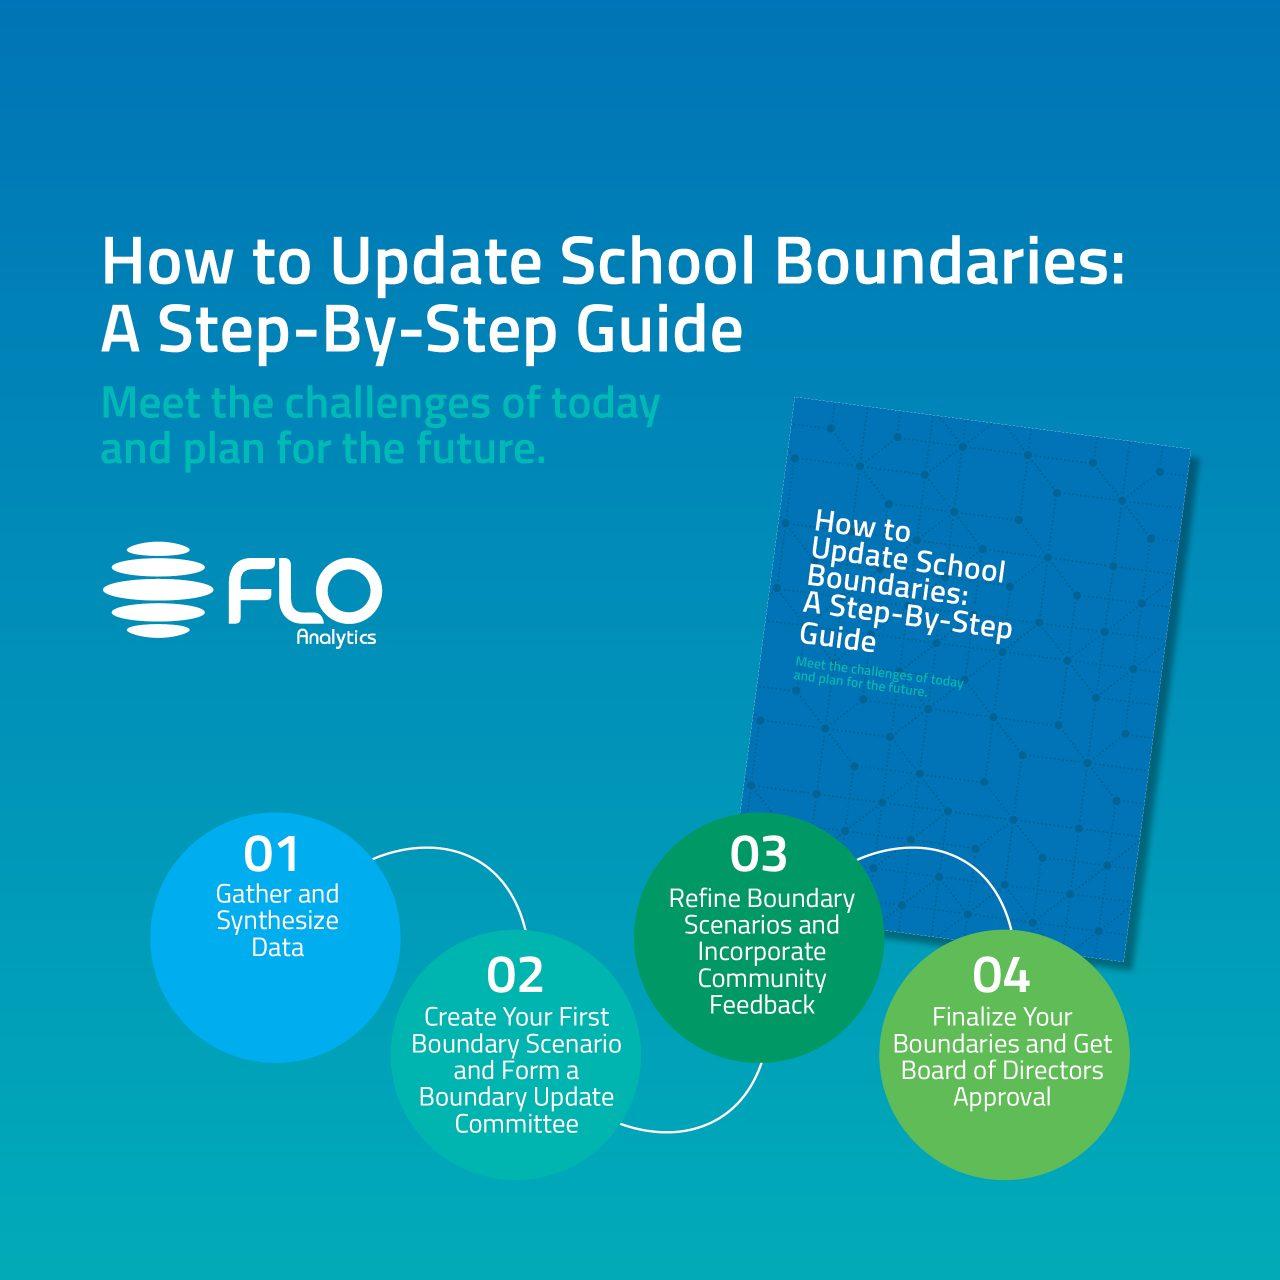 How to Update School Boundaries | FLO Analytics